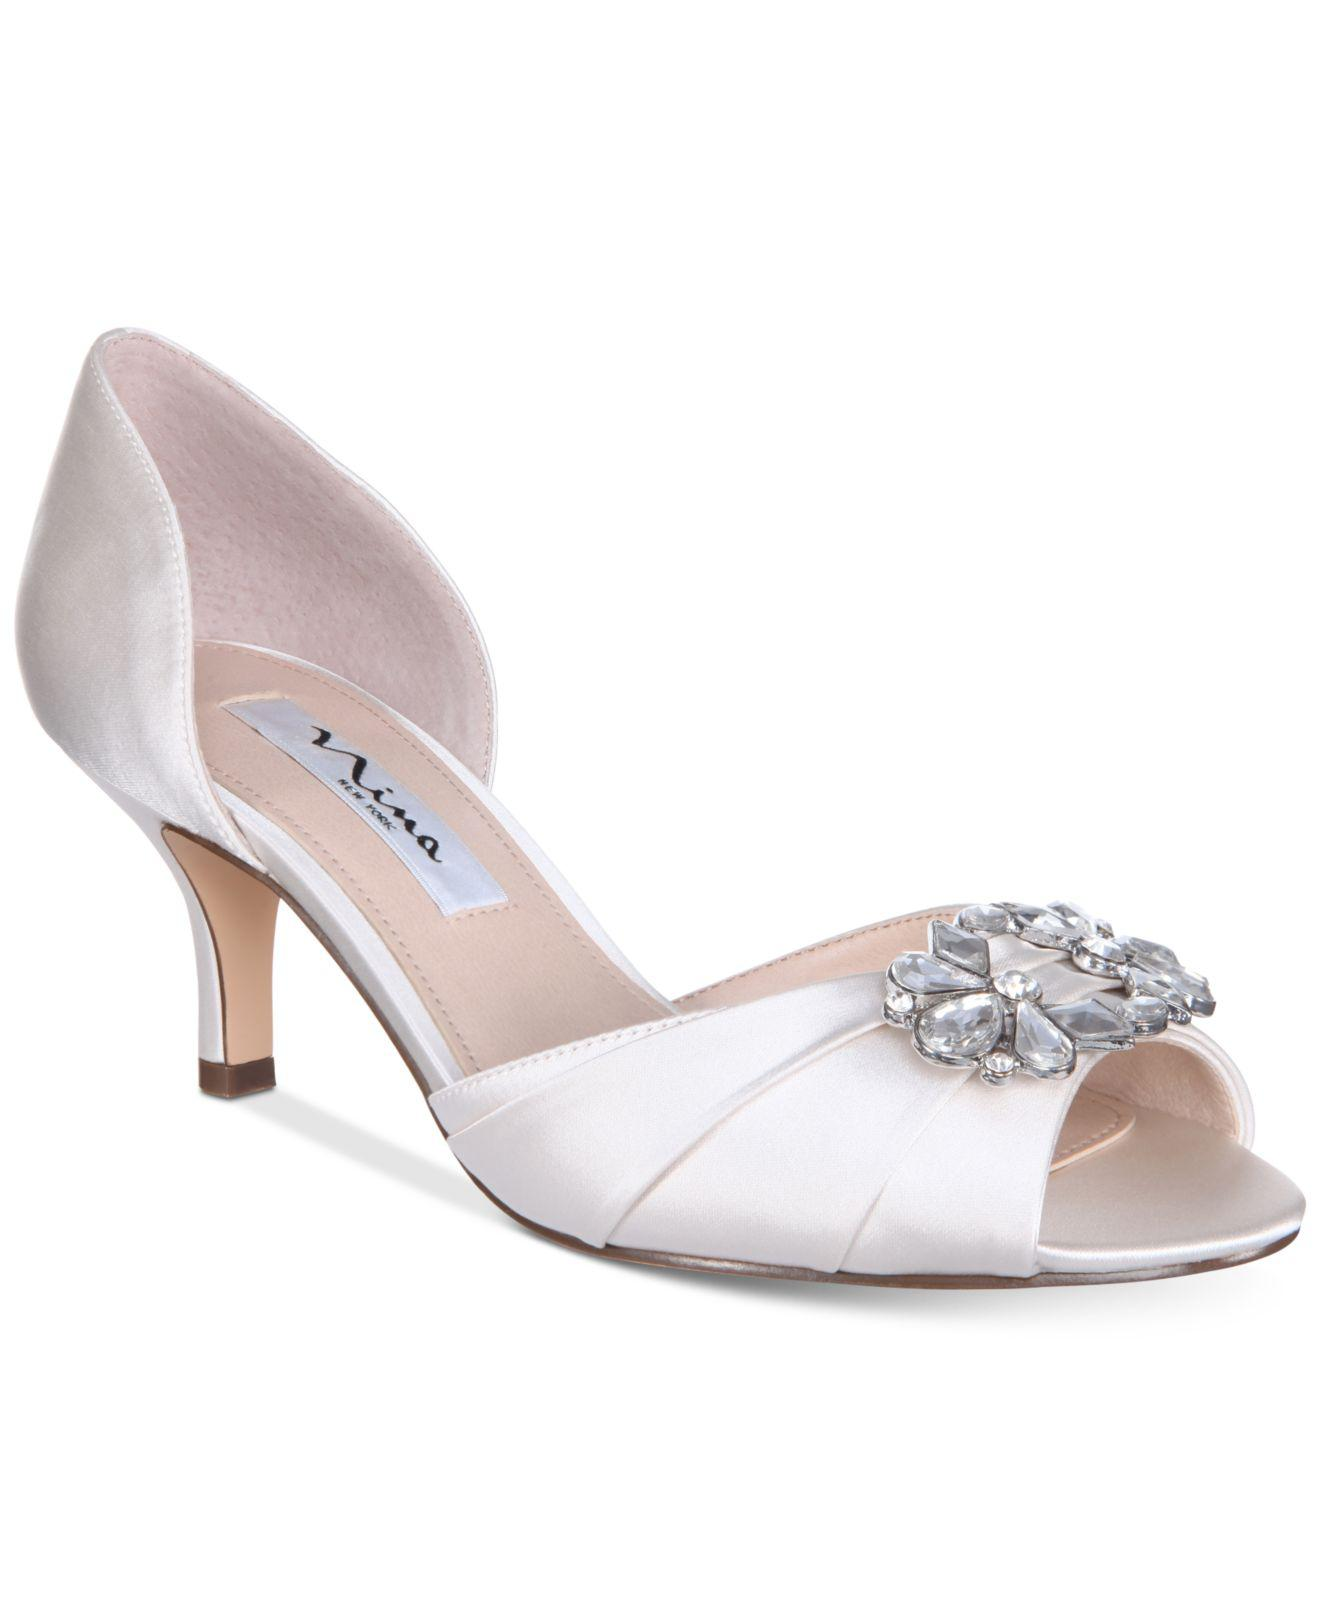 Nina Charisa Satin Crystal Brooch Peep-Toe d'Orsay Pumps XnaDCf6Q